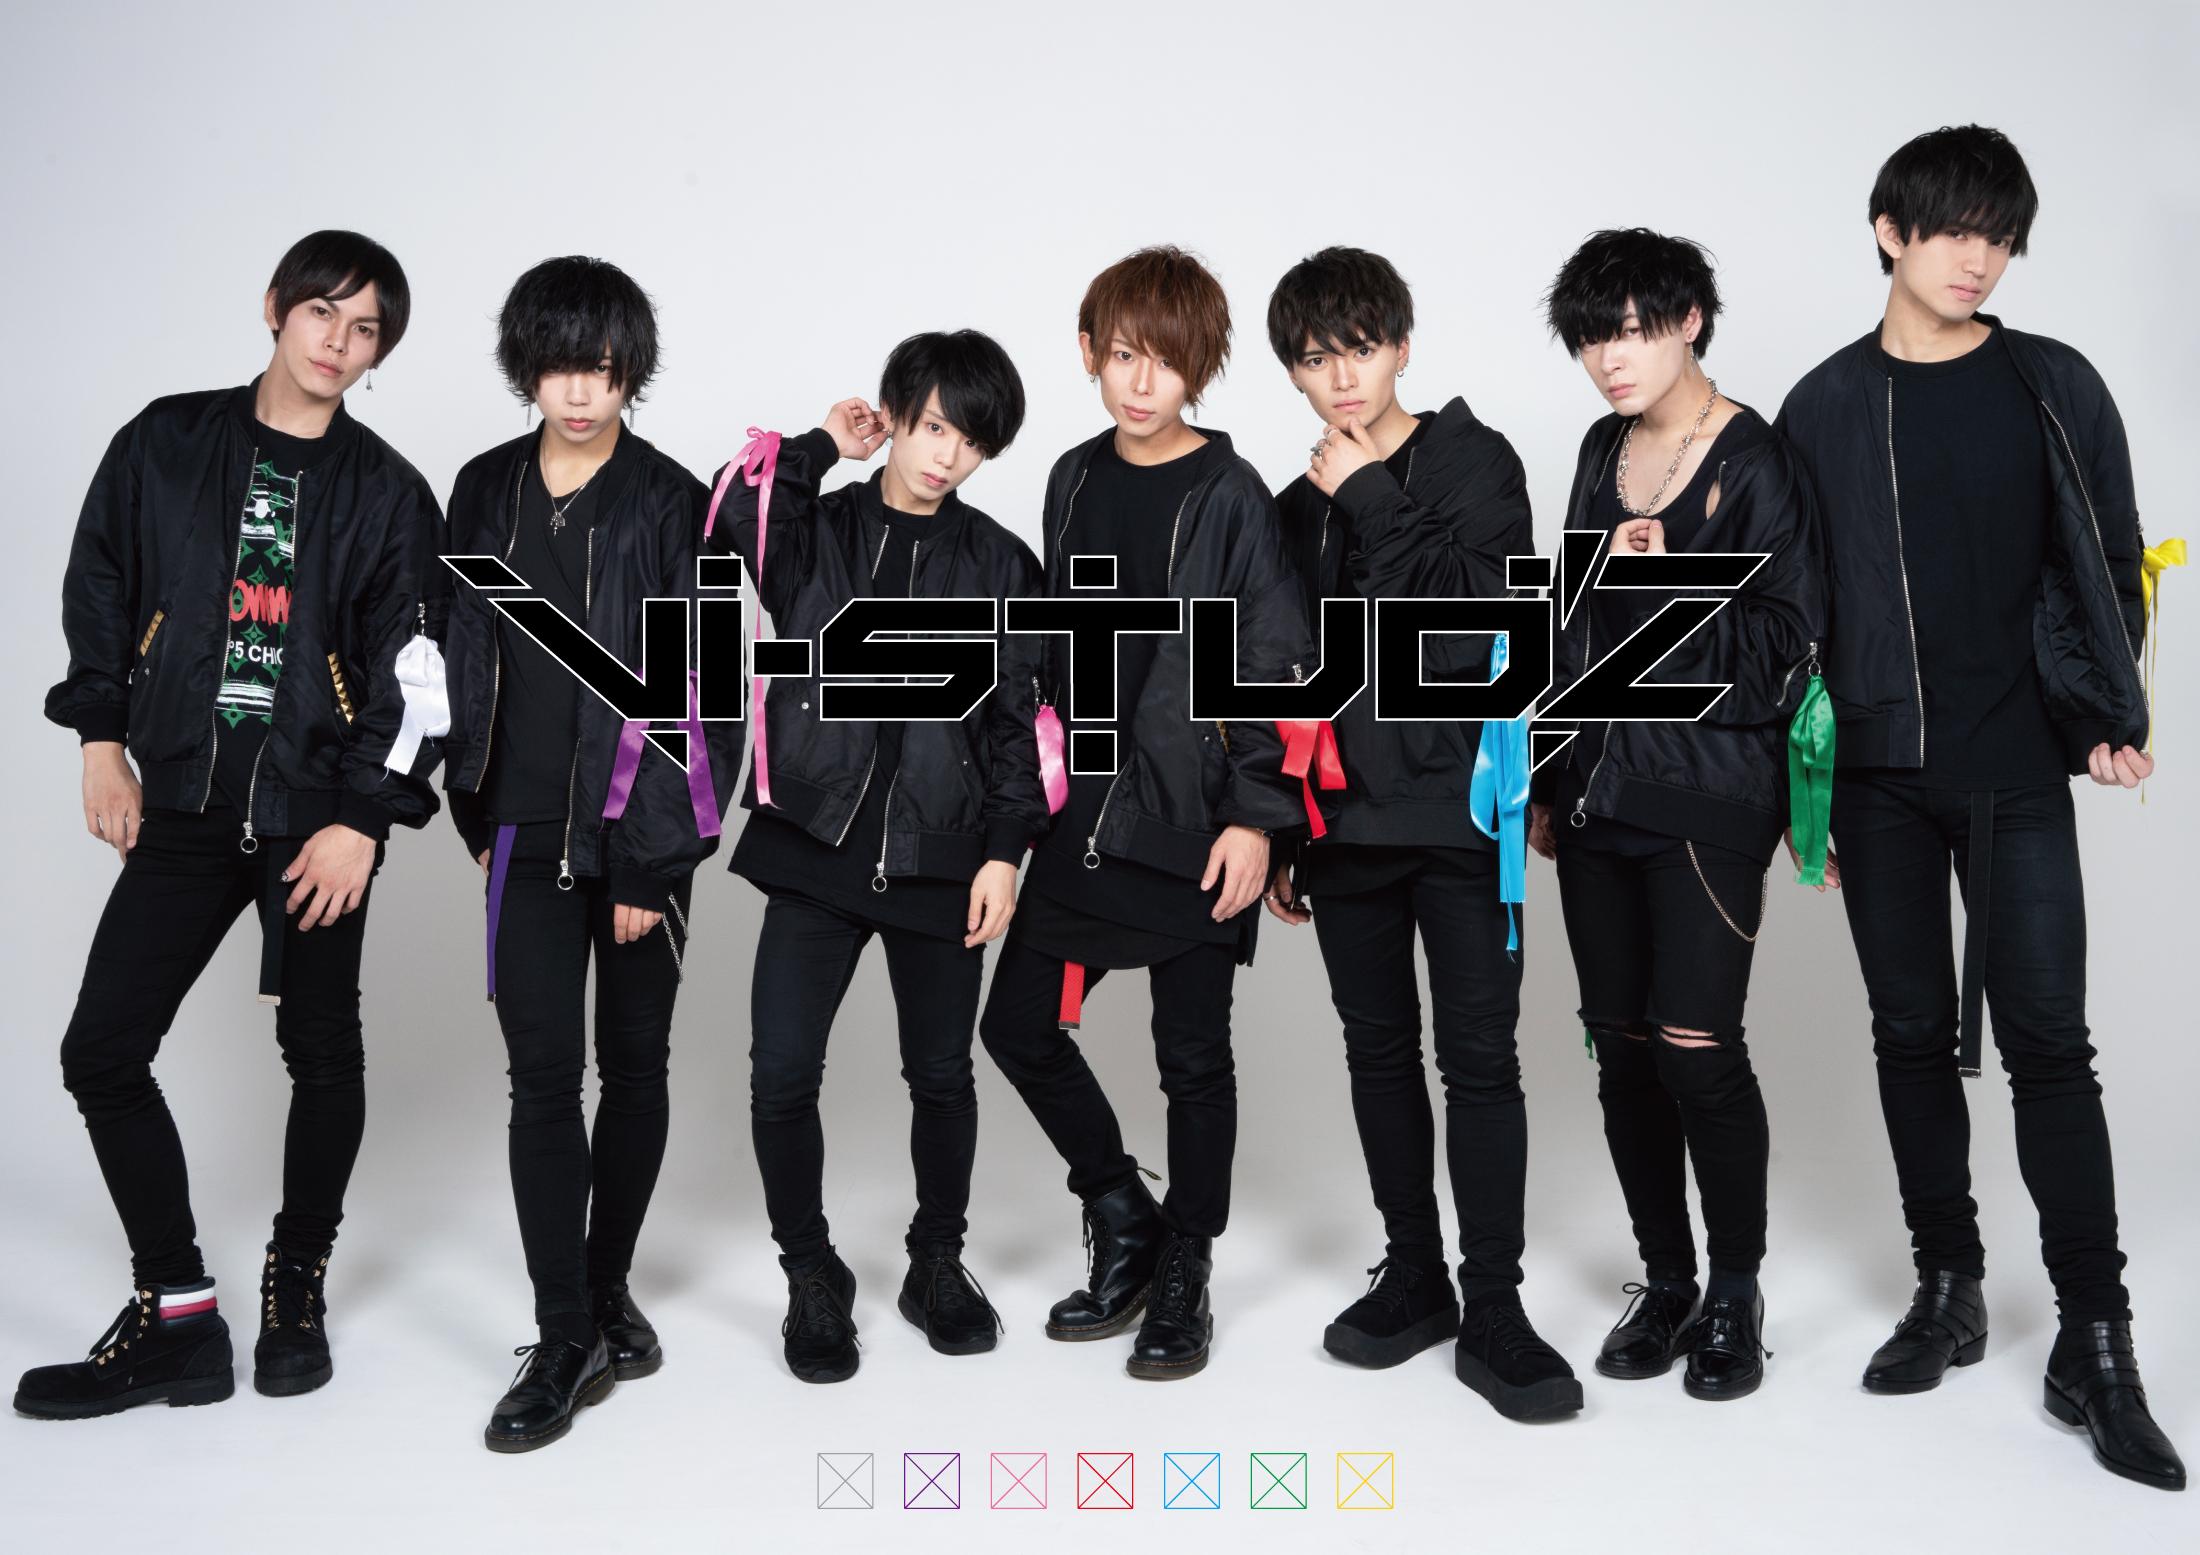 Vi-Stud'Z 10MONTH ANNIVERSARY LIVE〜夏だ!祭りだ!法被でHAPPY LIVE !〜